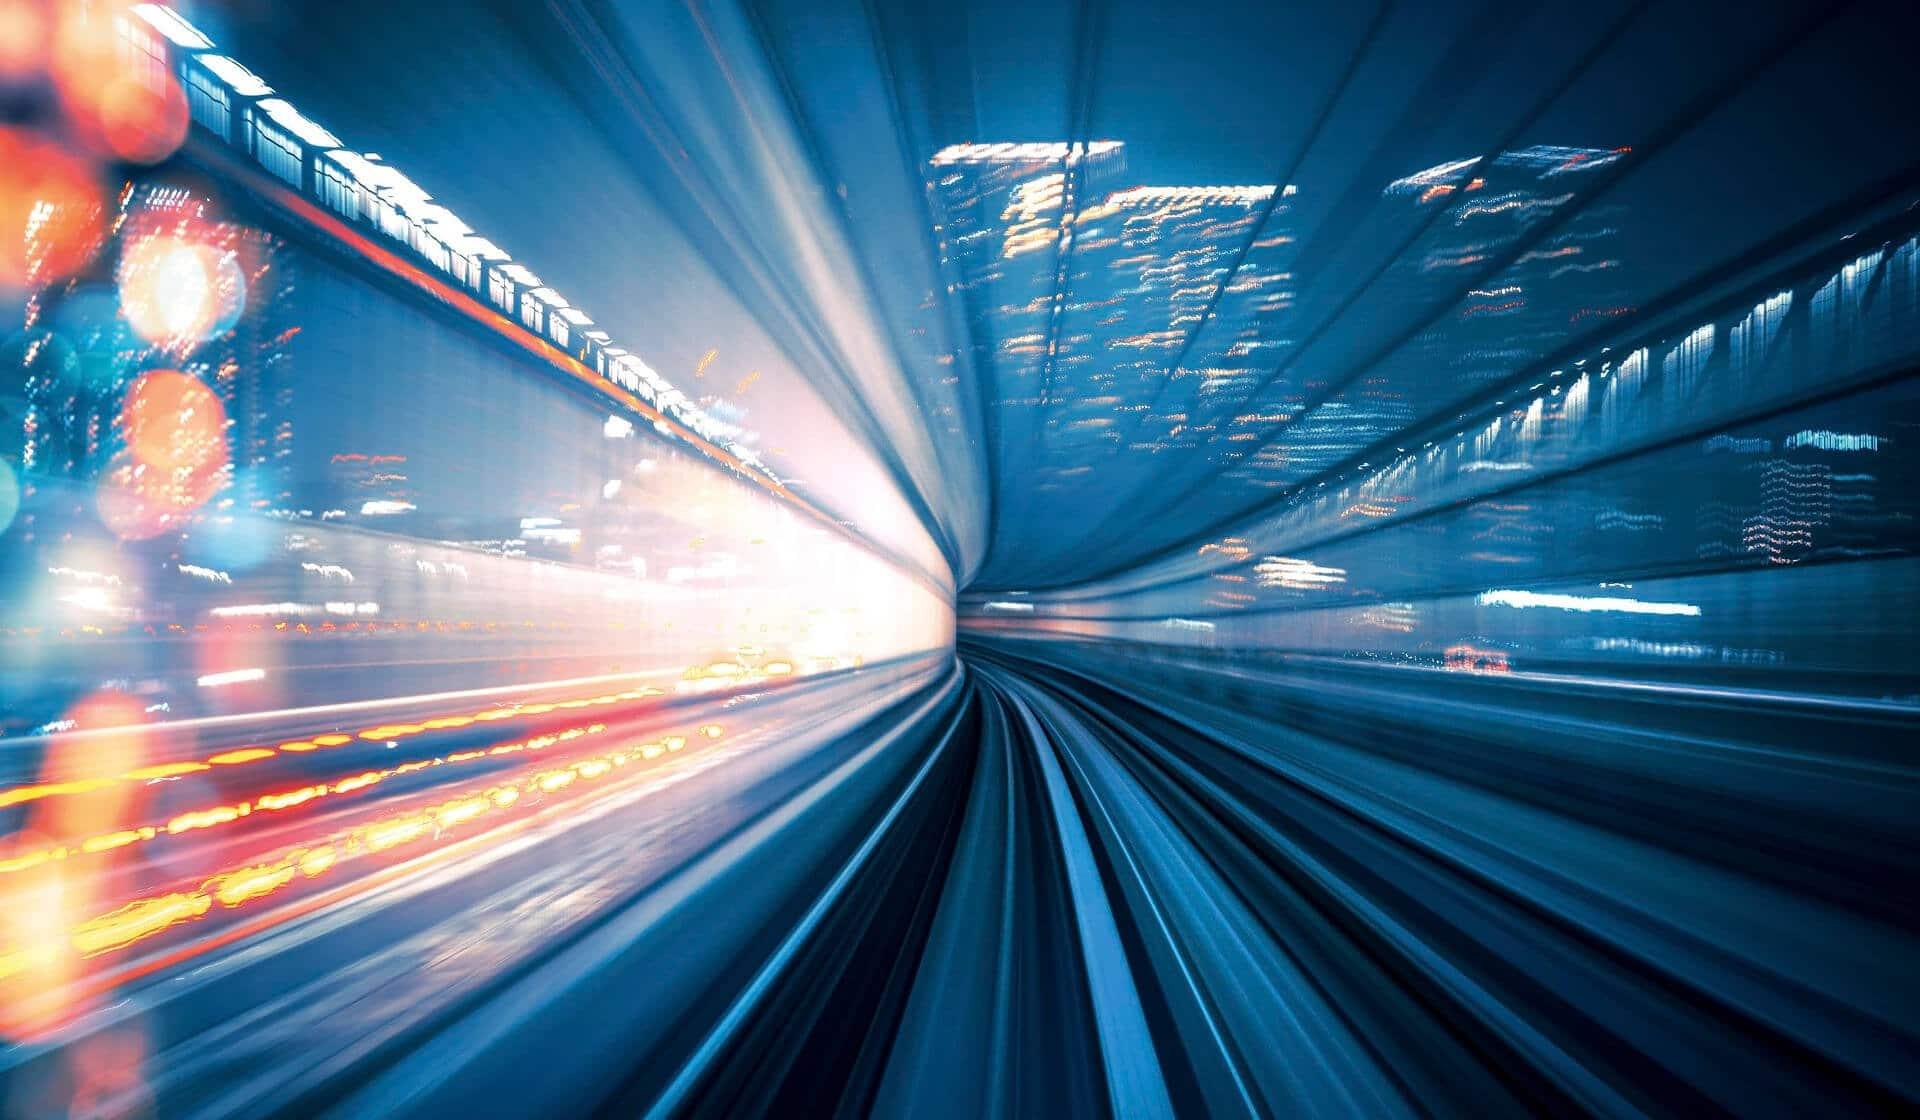 How to Get NTSA Smart Driving License in Kenya (2020 Update)